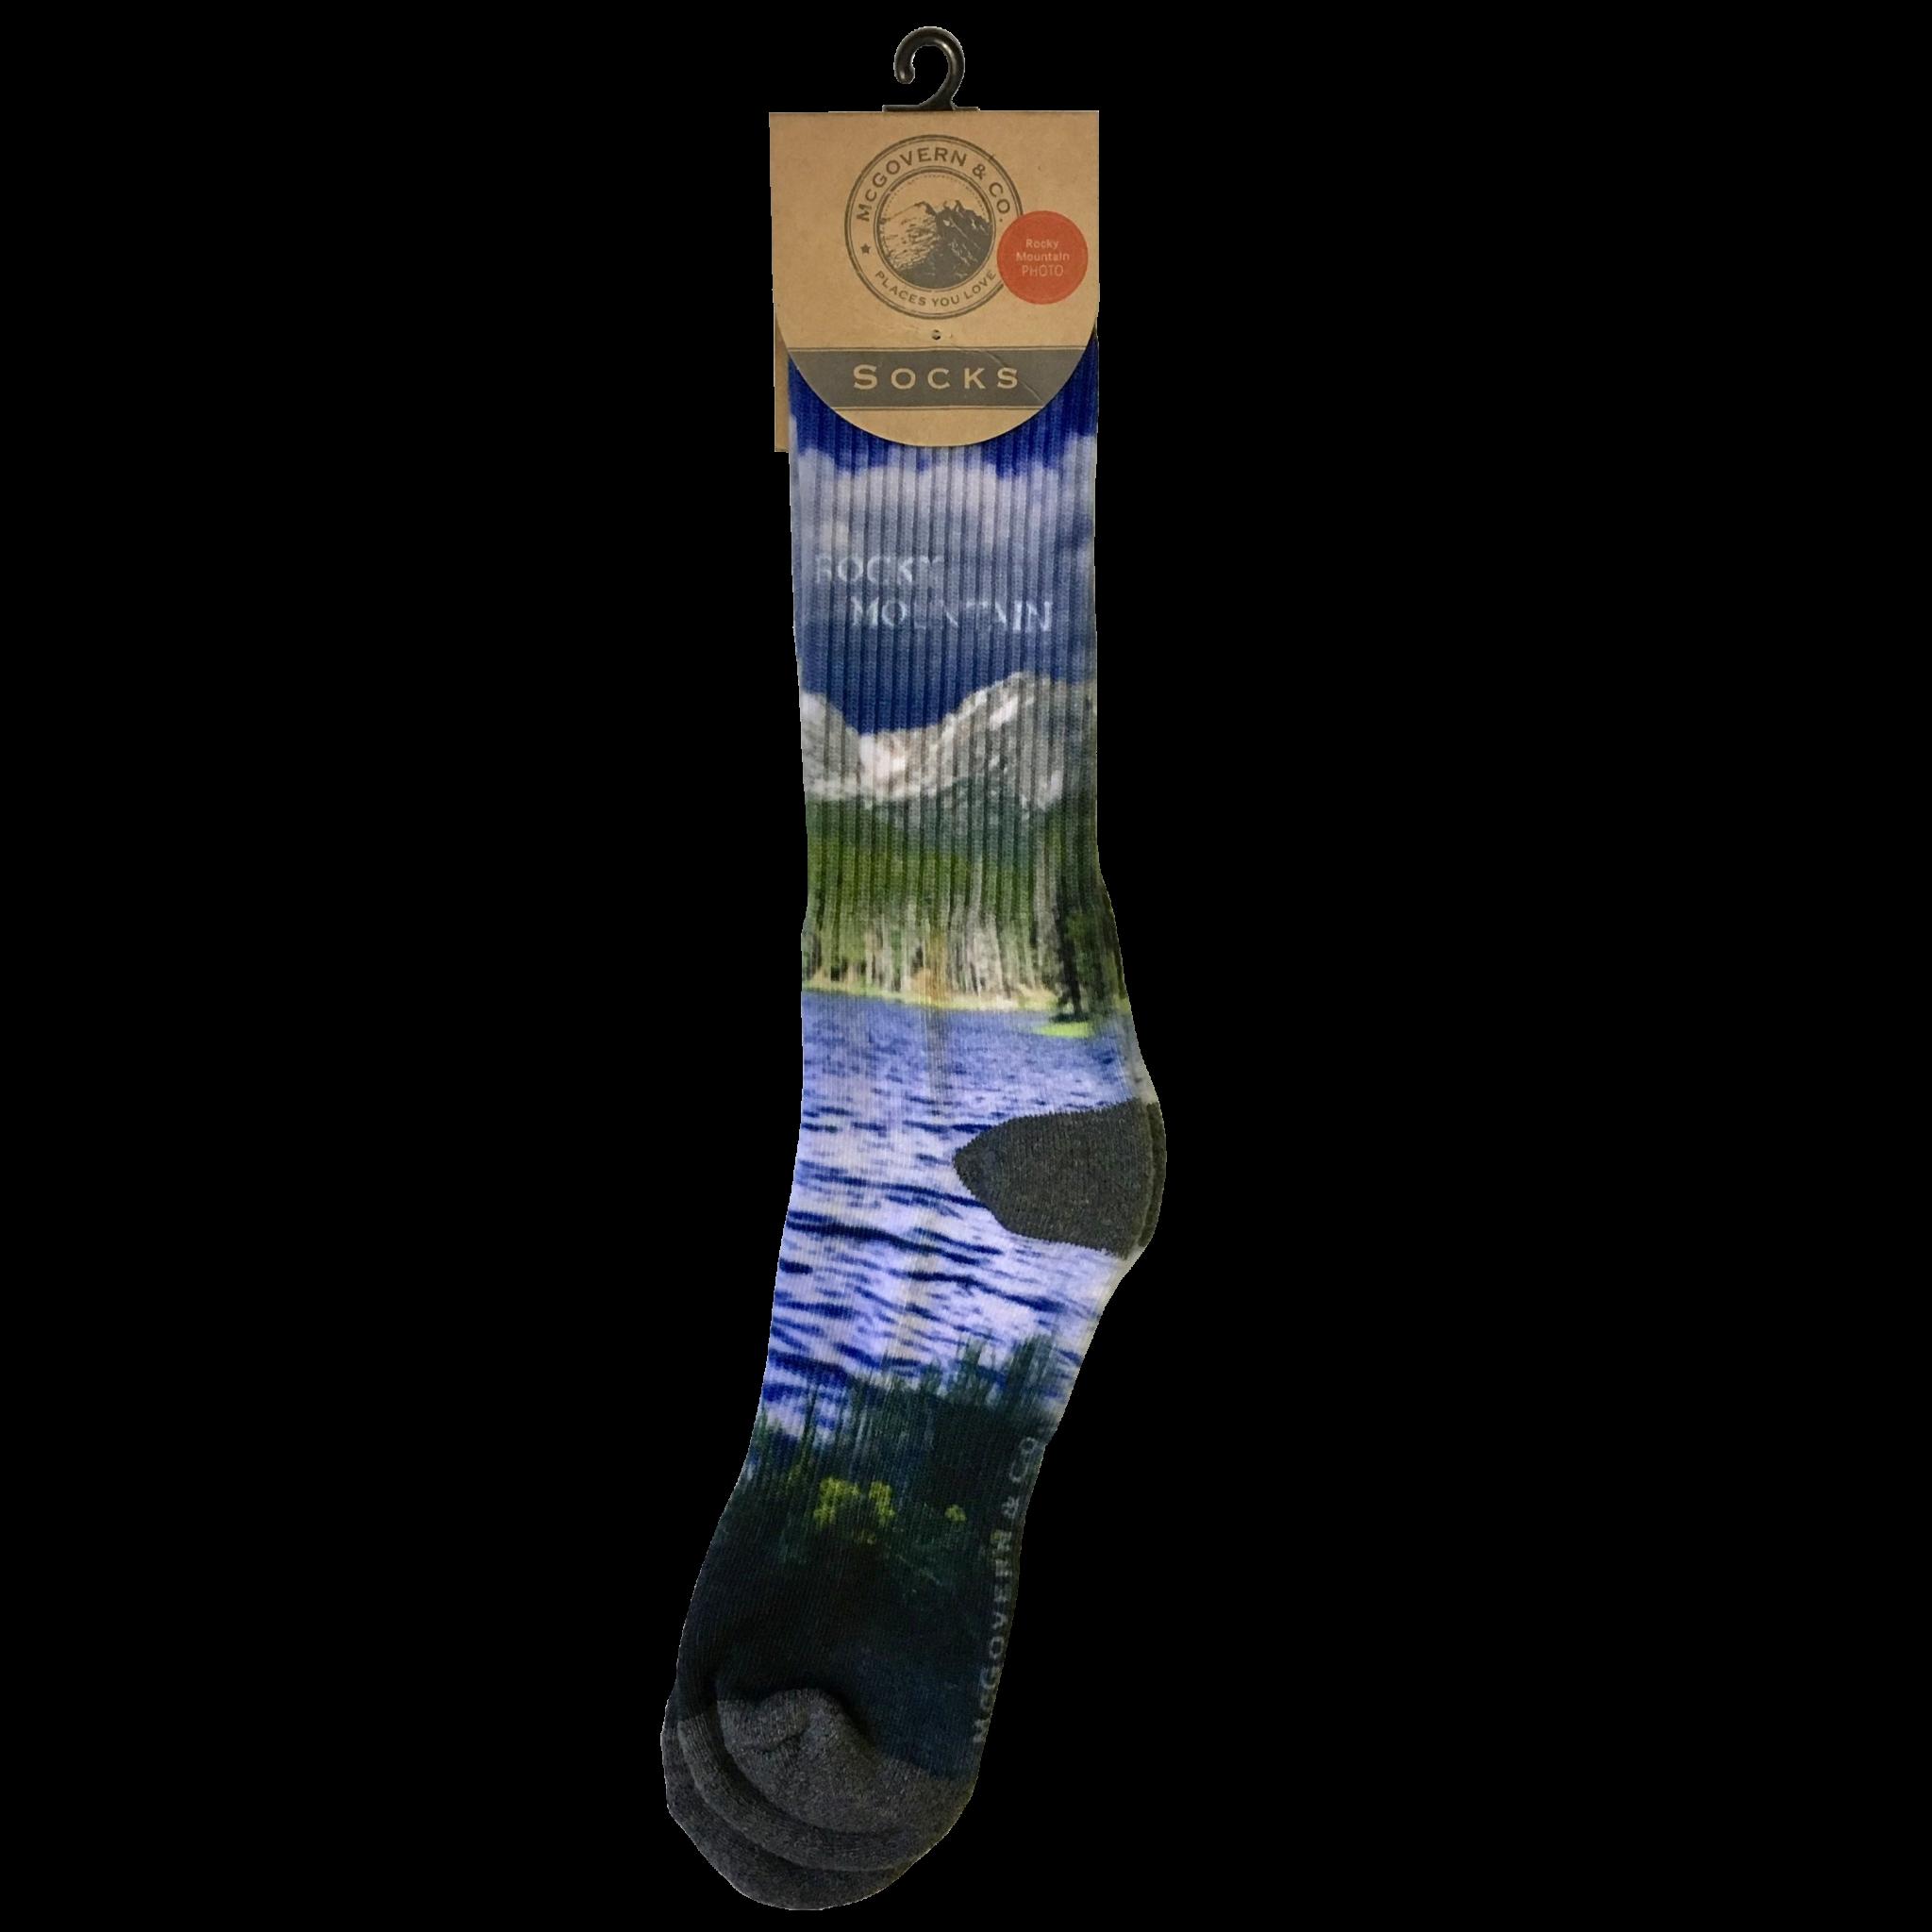 Picture socks